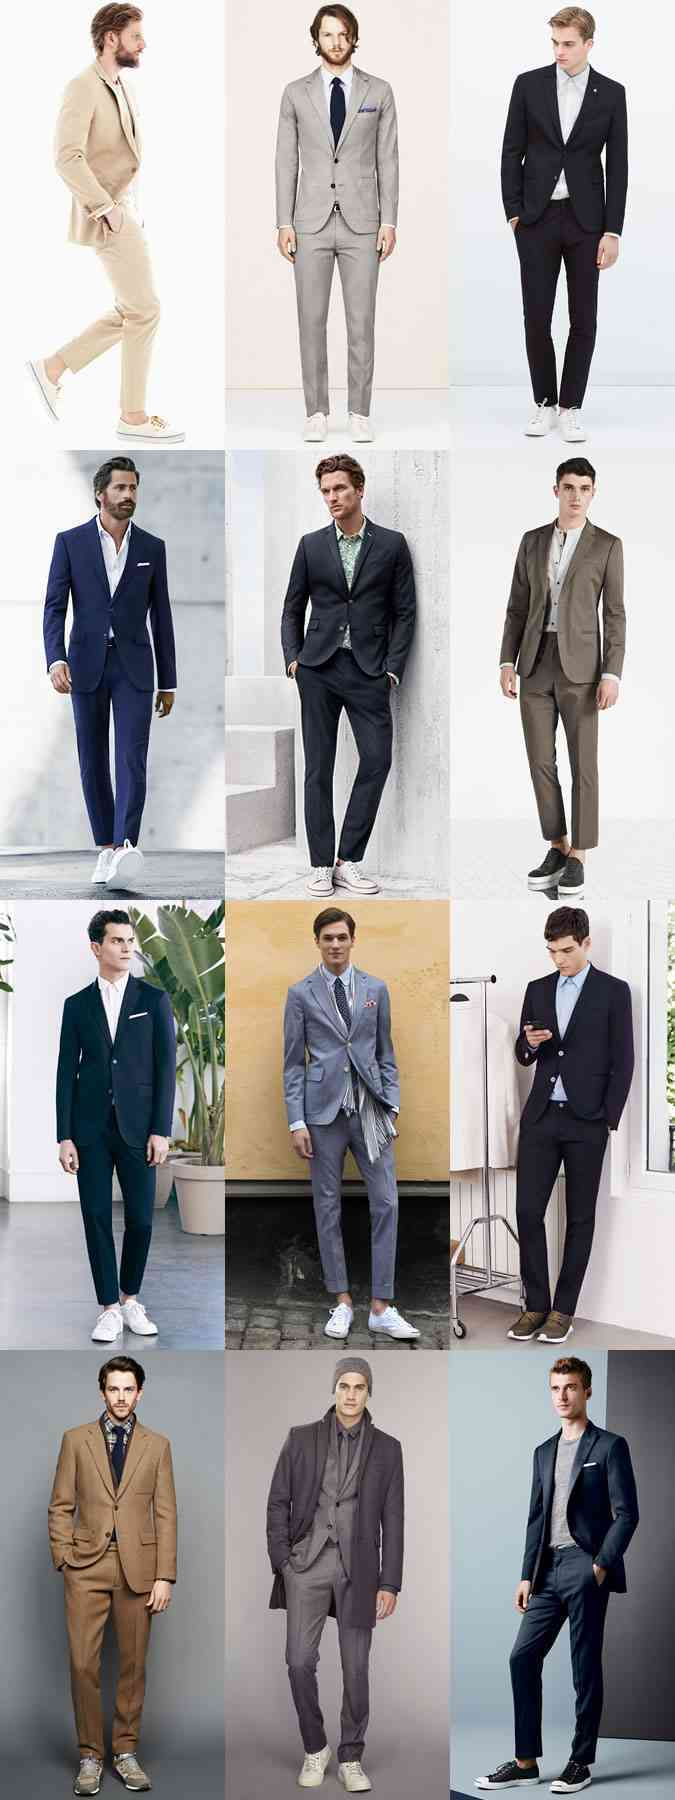 moda barbati 2015 costum pantofi sport